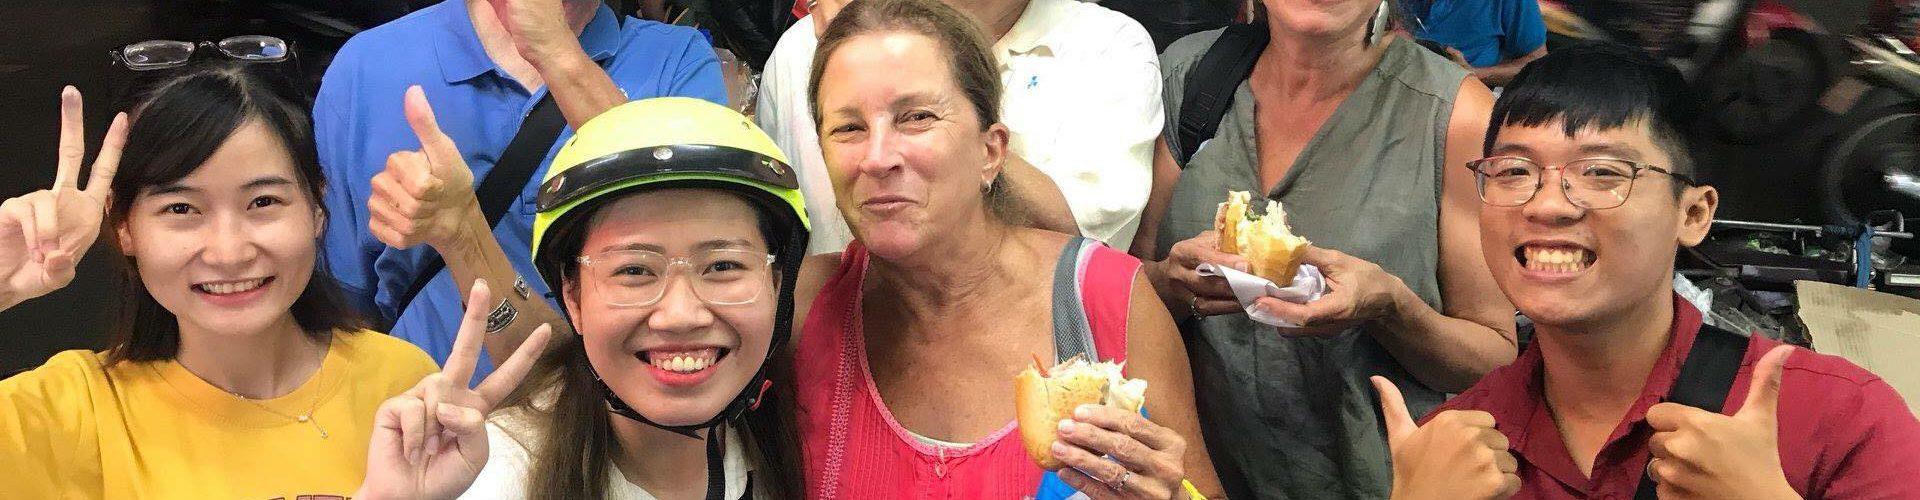 Saigon street food tour - Banh Mi must try in Vietnam popular food